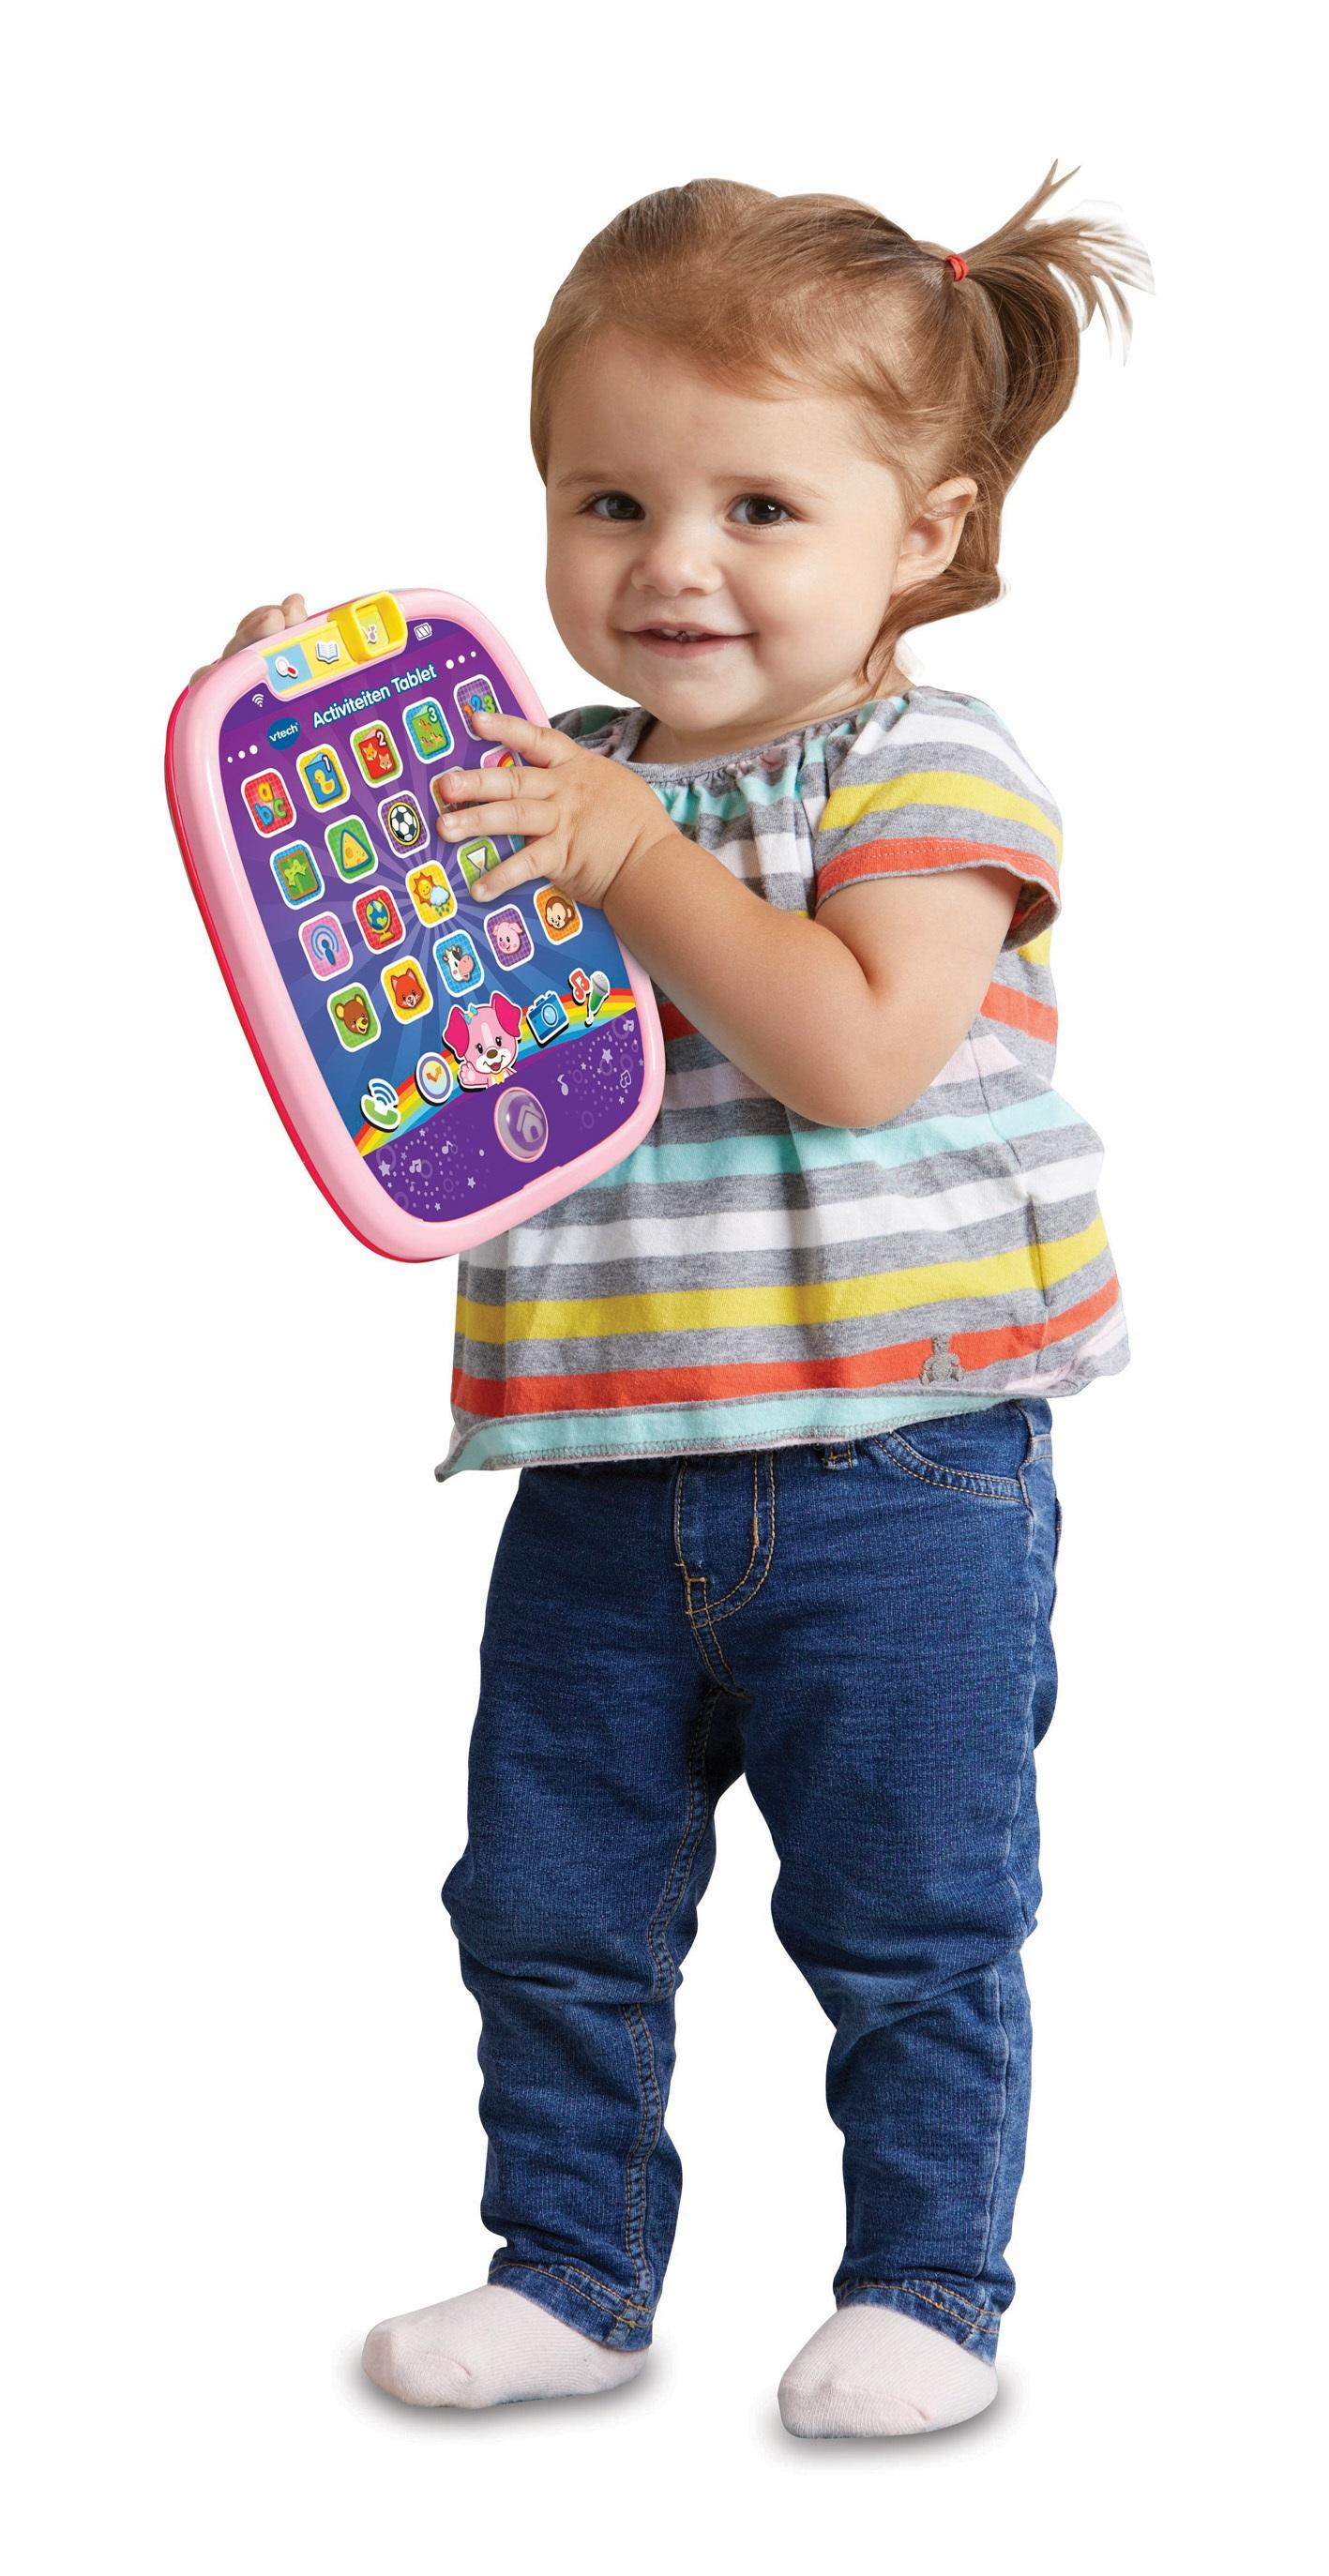 VTech Baby Activiteiten Tablet roze Ragazza giocattolo educativo